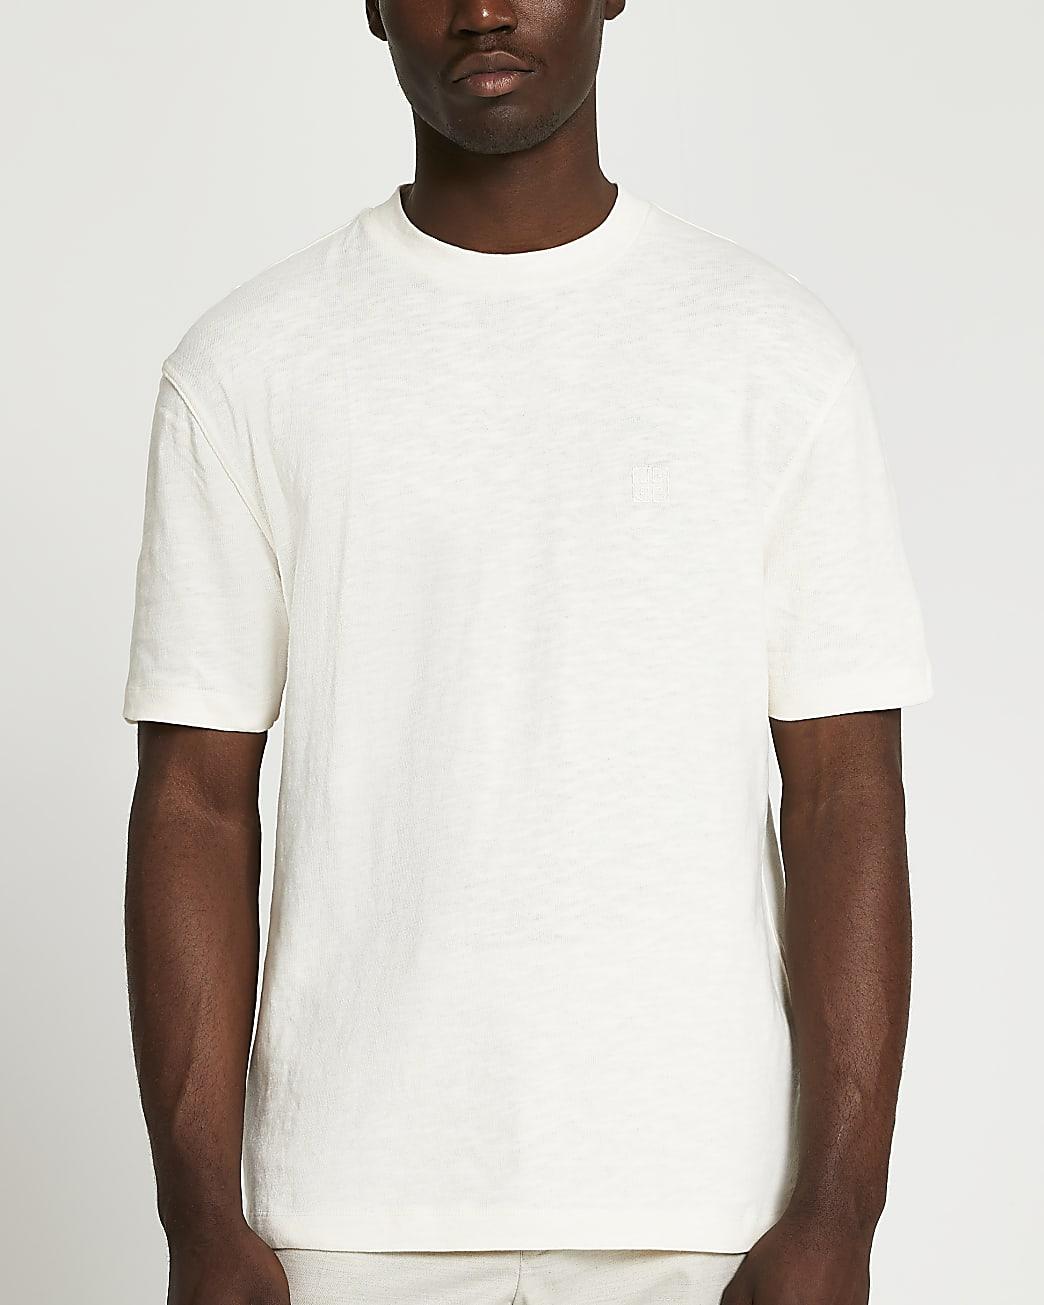 Cream cotton regular fit slub t-shirt